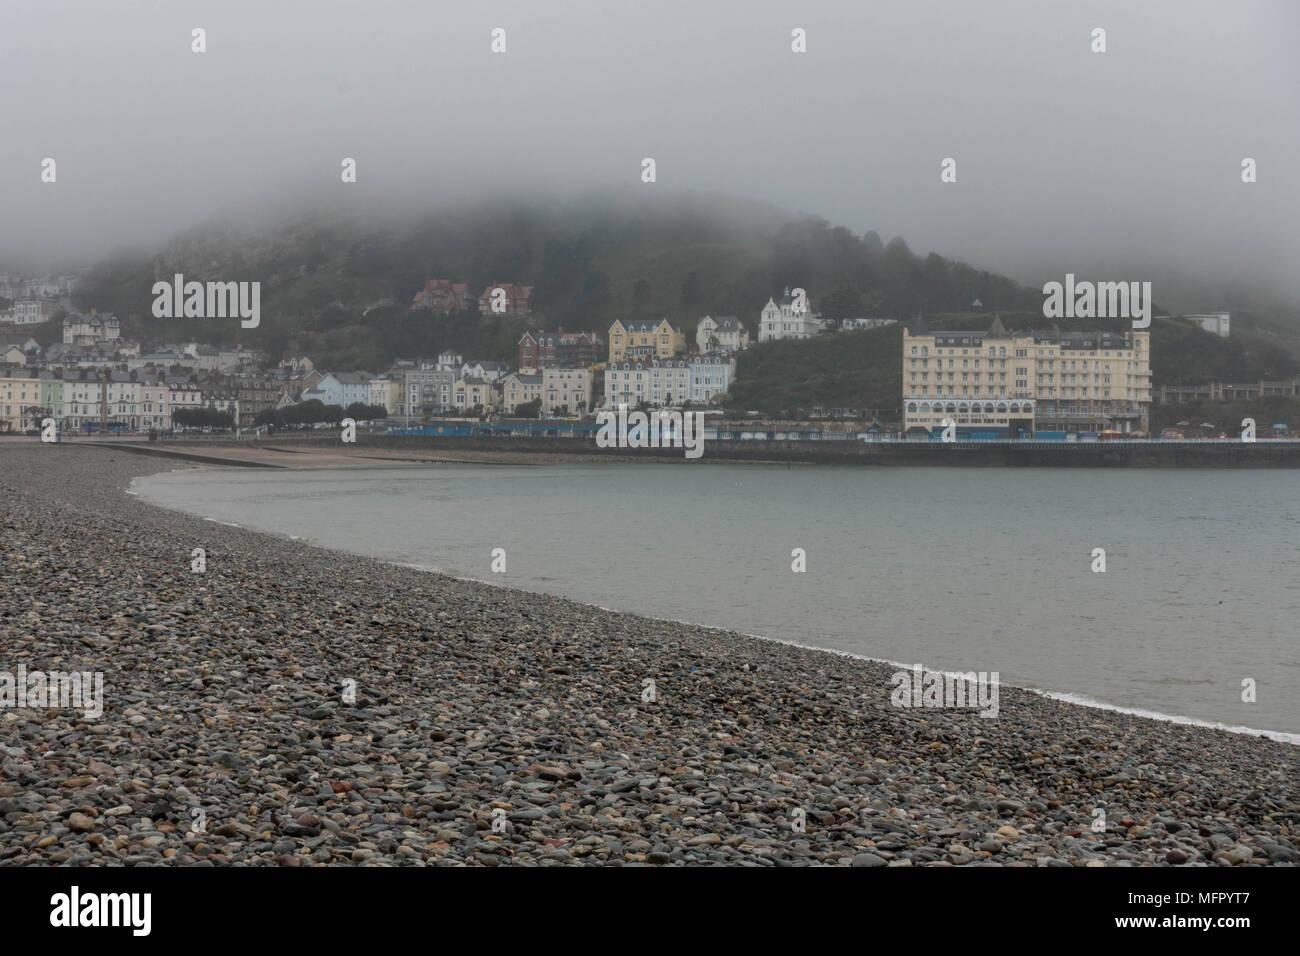 LLandudno seafront on a rainy April Day 2018 - Stock Image